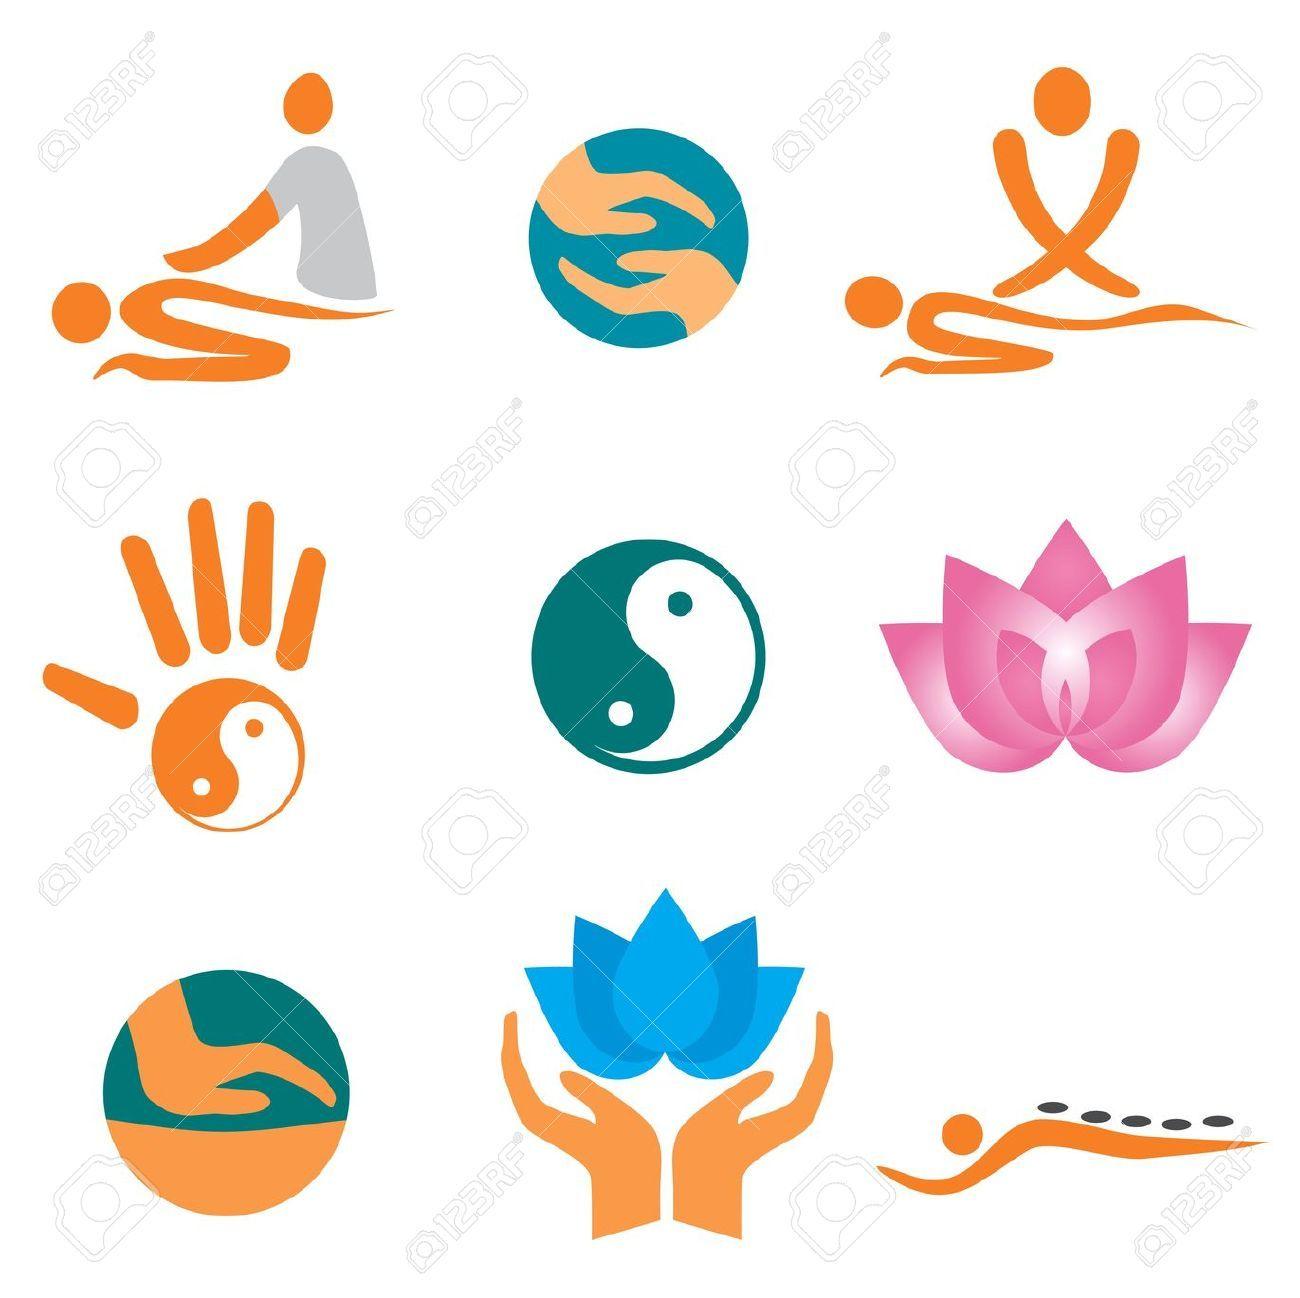 Rezultat iskanja slik za shiatsu massage symbol Massage